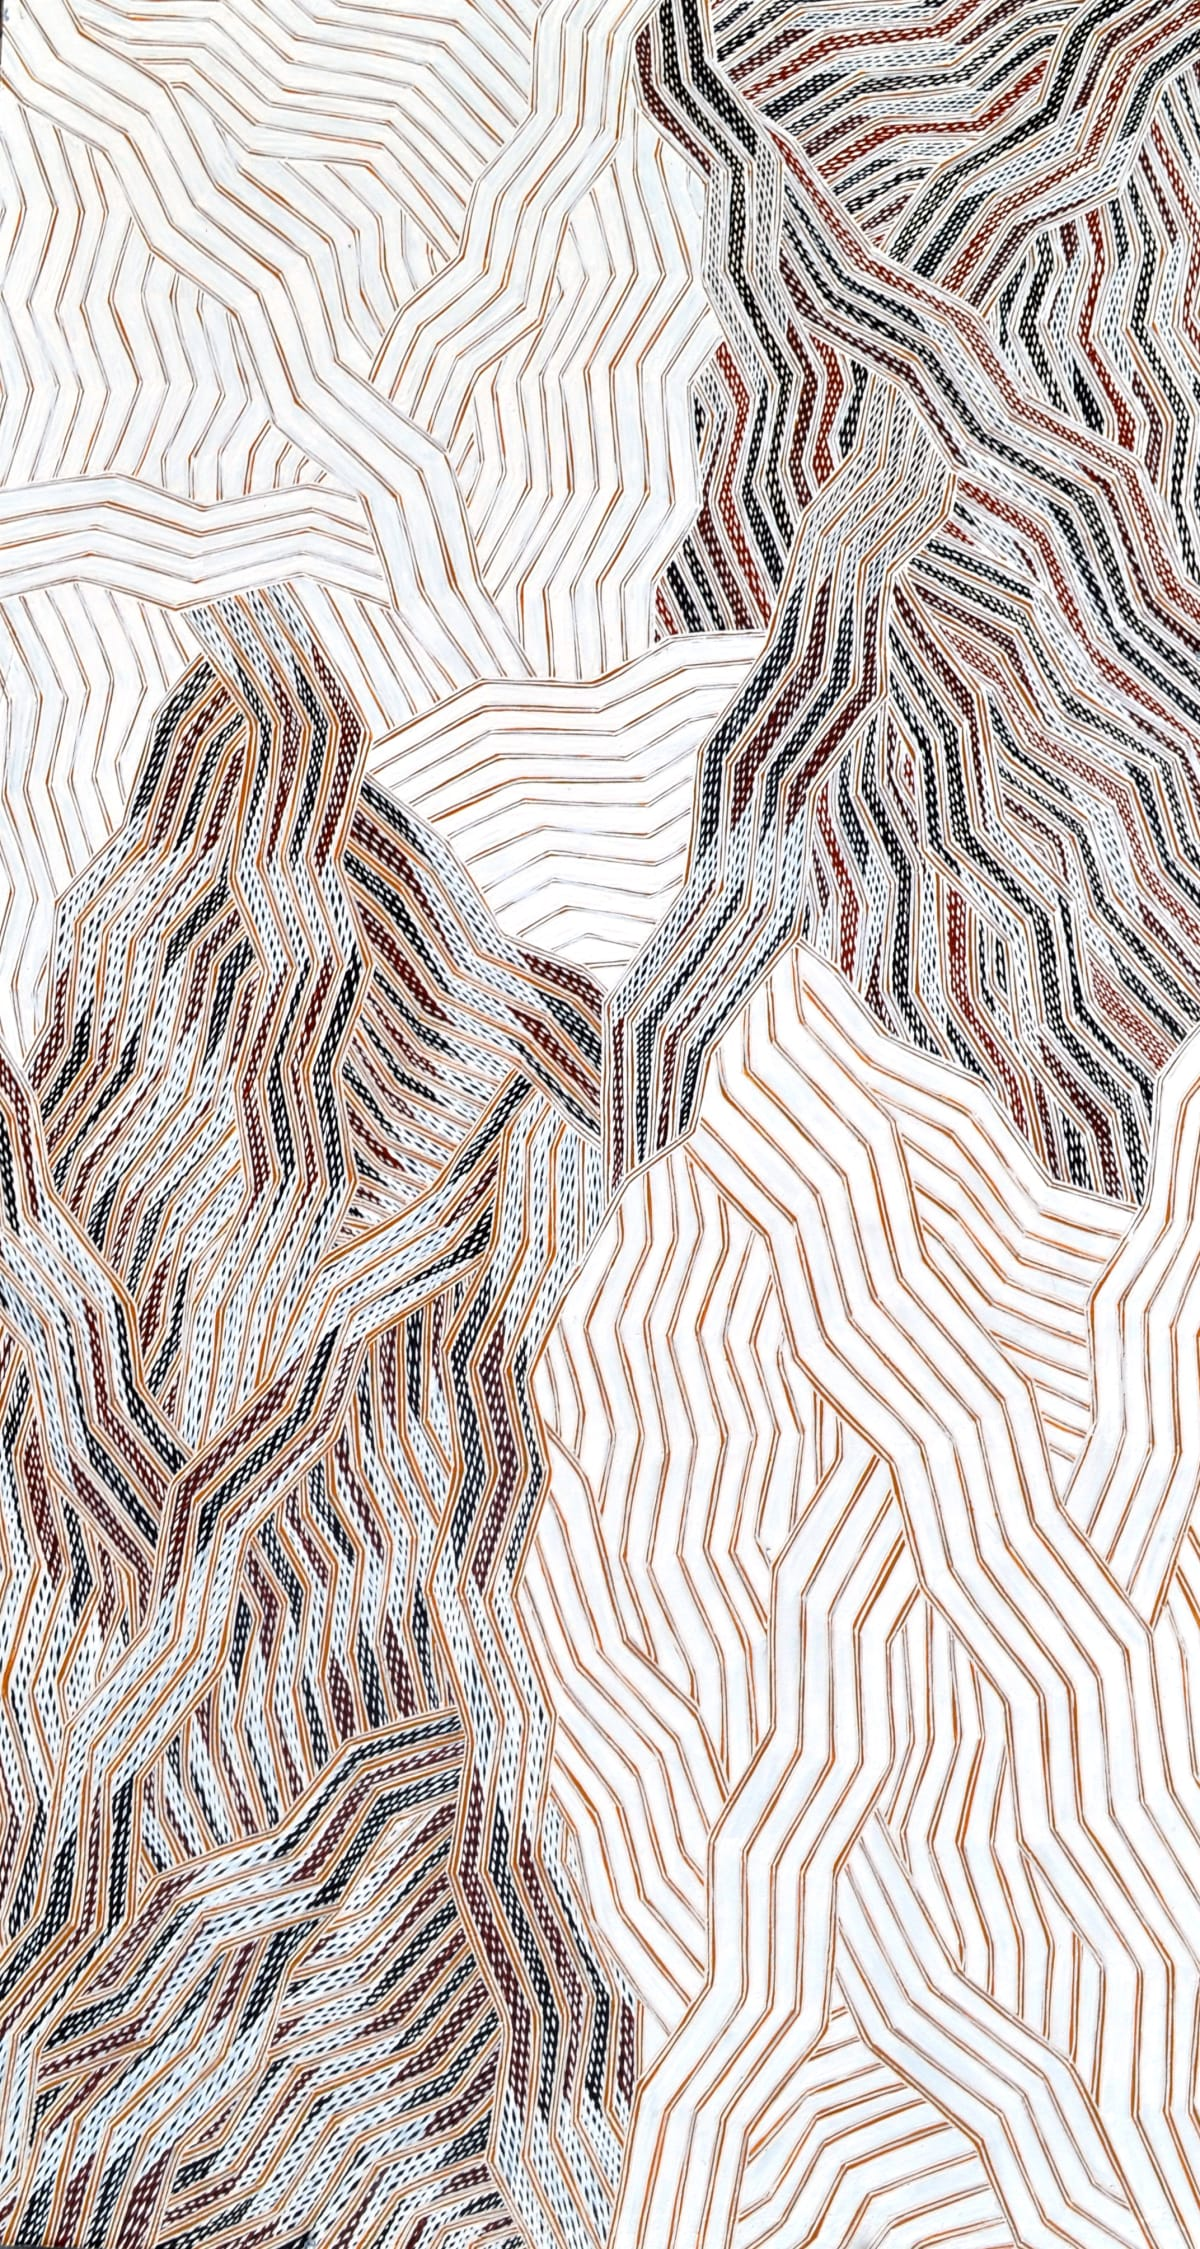 Lamangirra #2 Gumana Garraparra natural earth pigment on board 121 x 67 cm